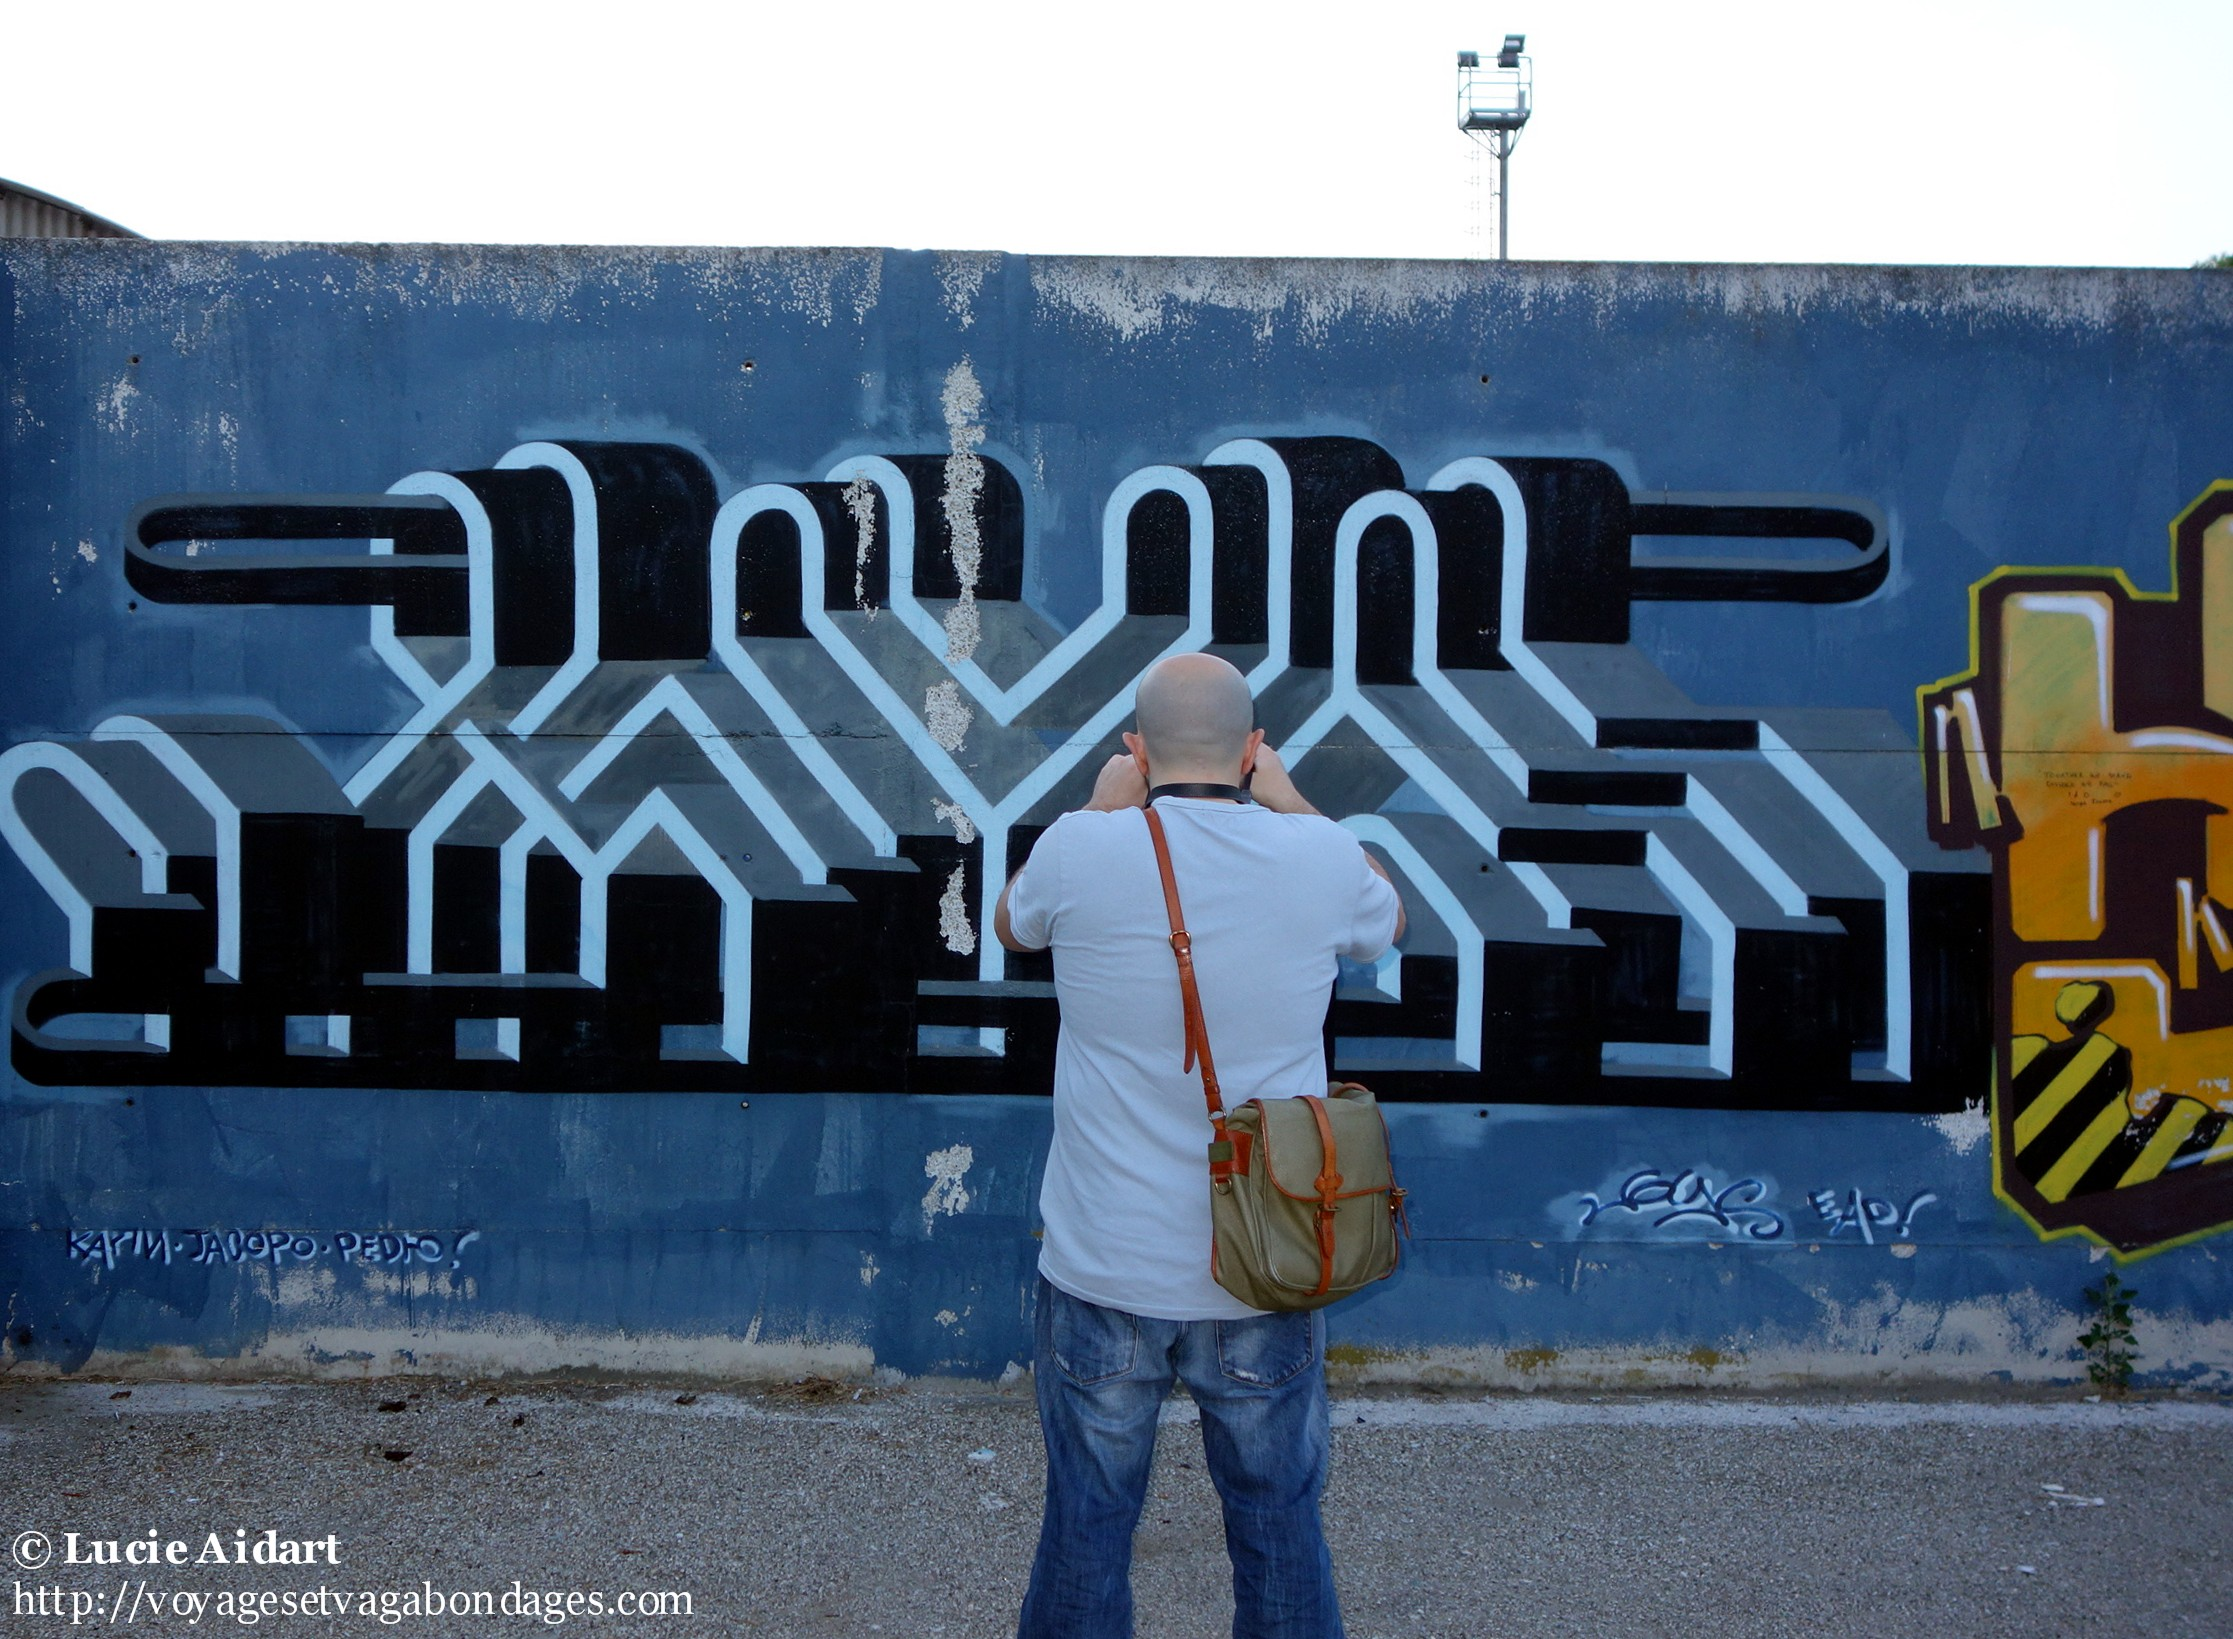 Ravenne, Street art Photo tour, Blogville